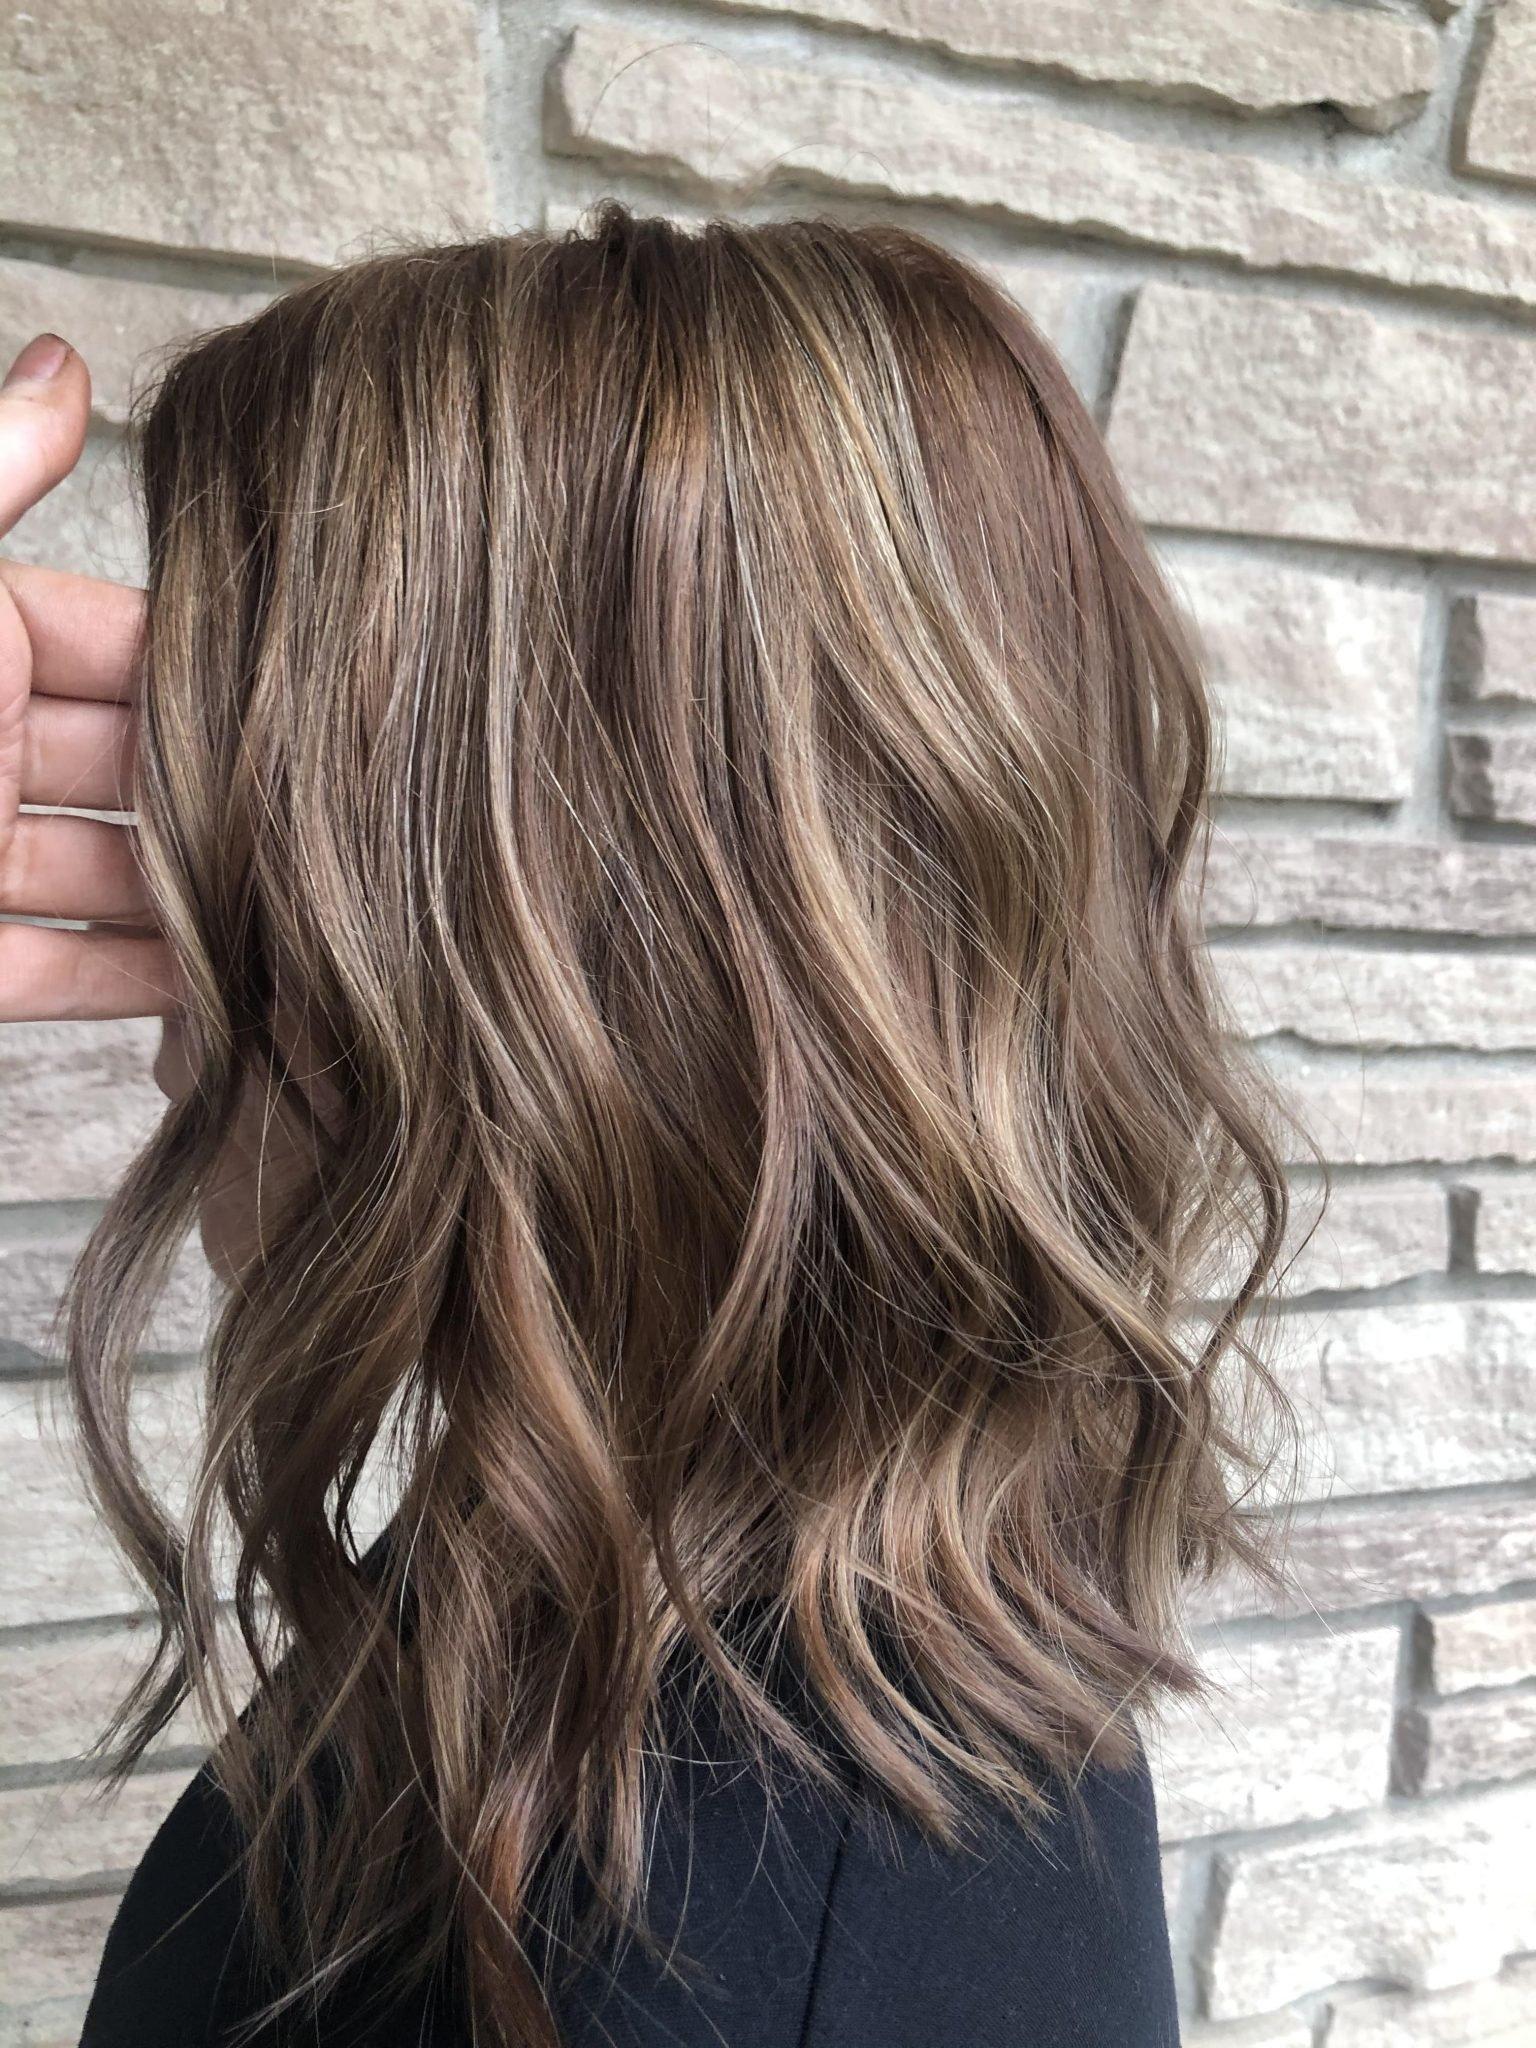 Best Hairstyles for Women in 2020 - 100+ Trending Ideas